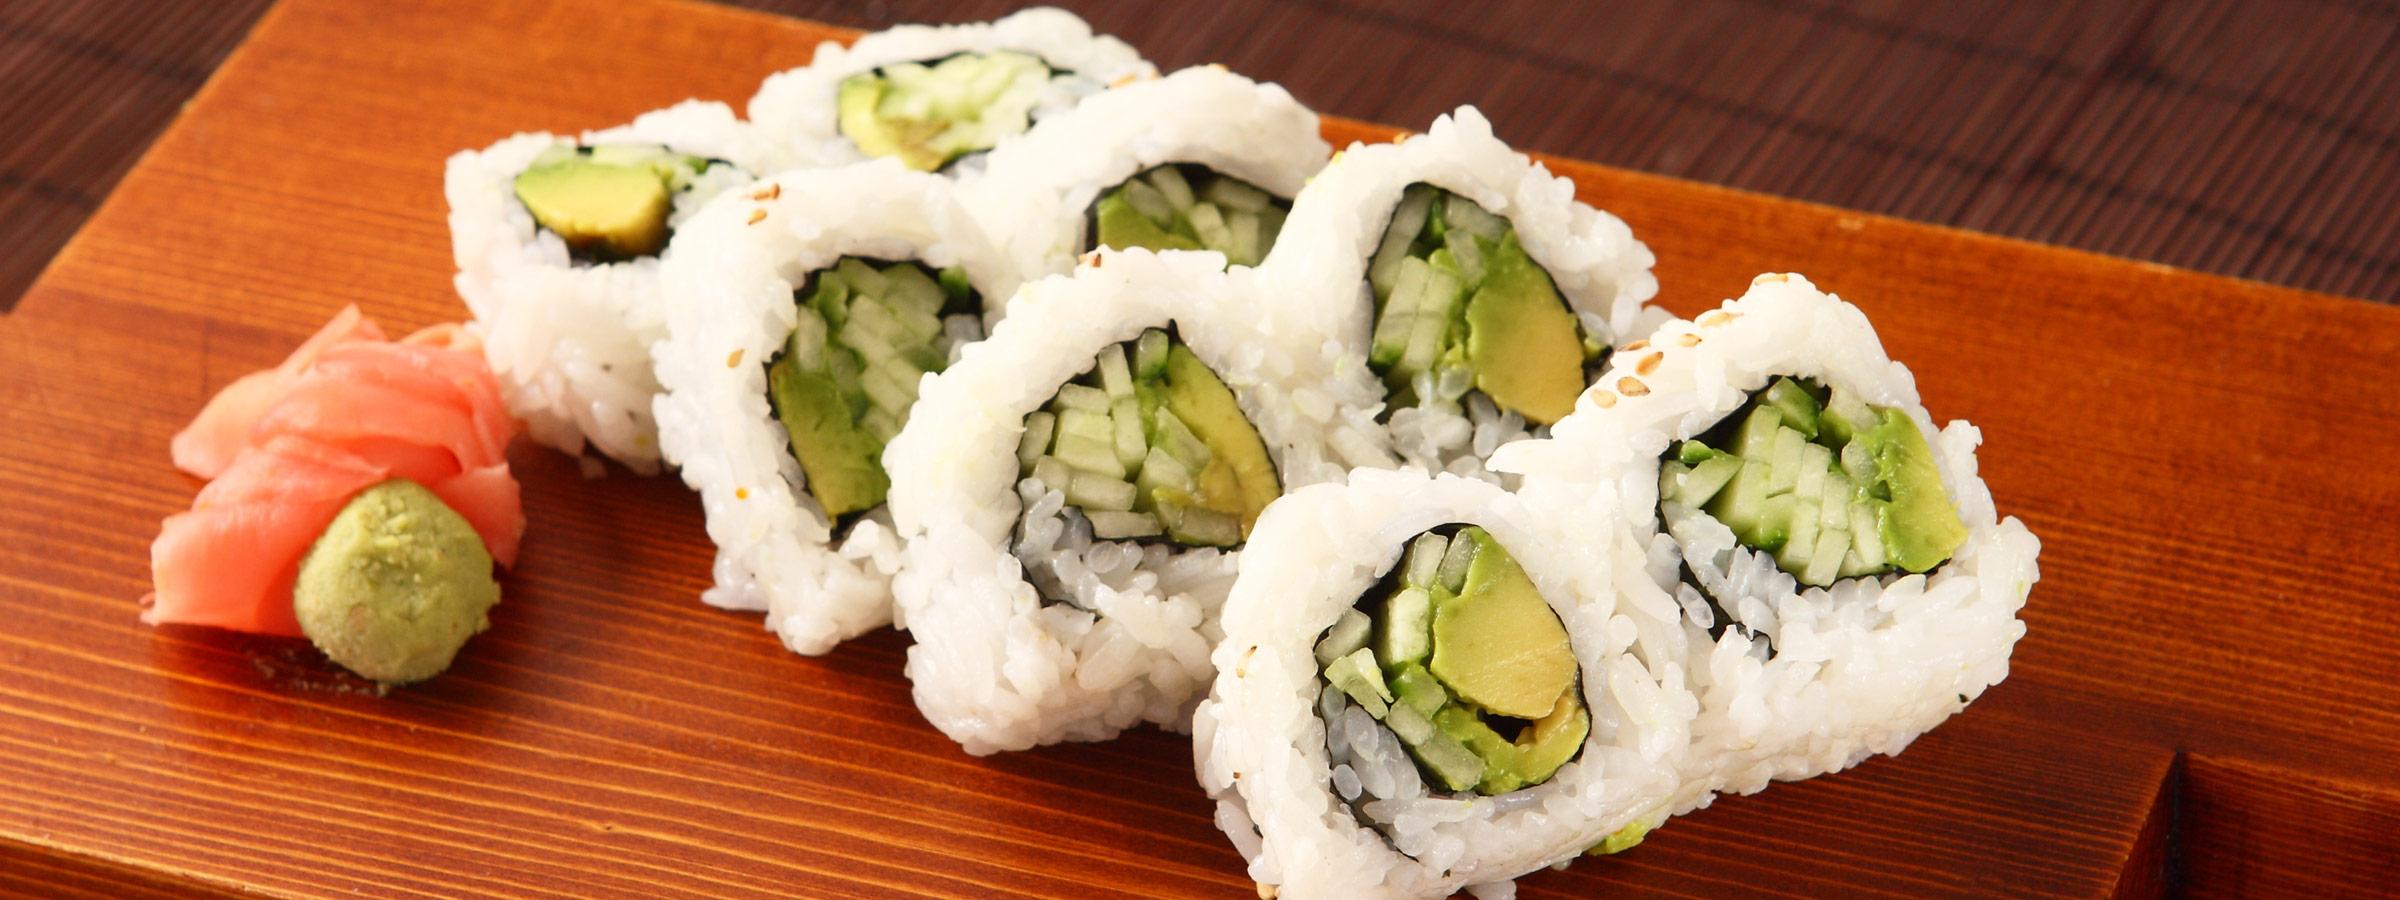 simple vegan sushi roll